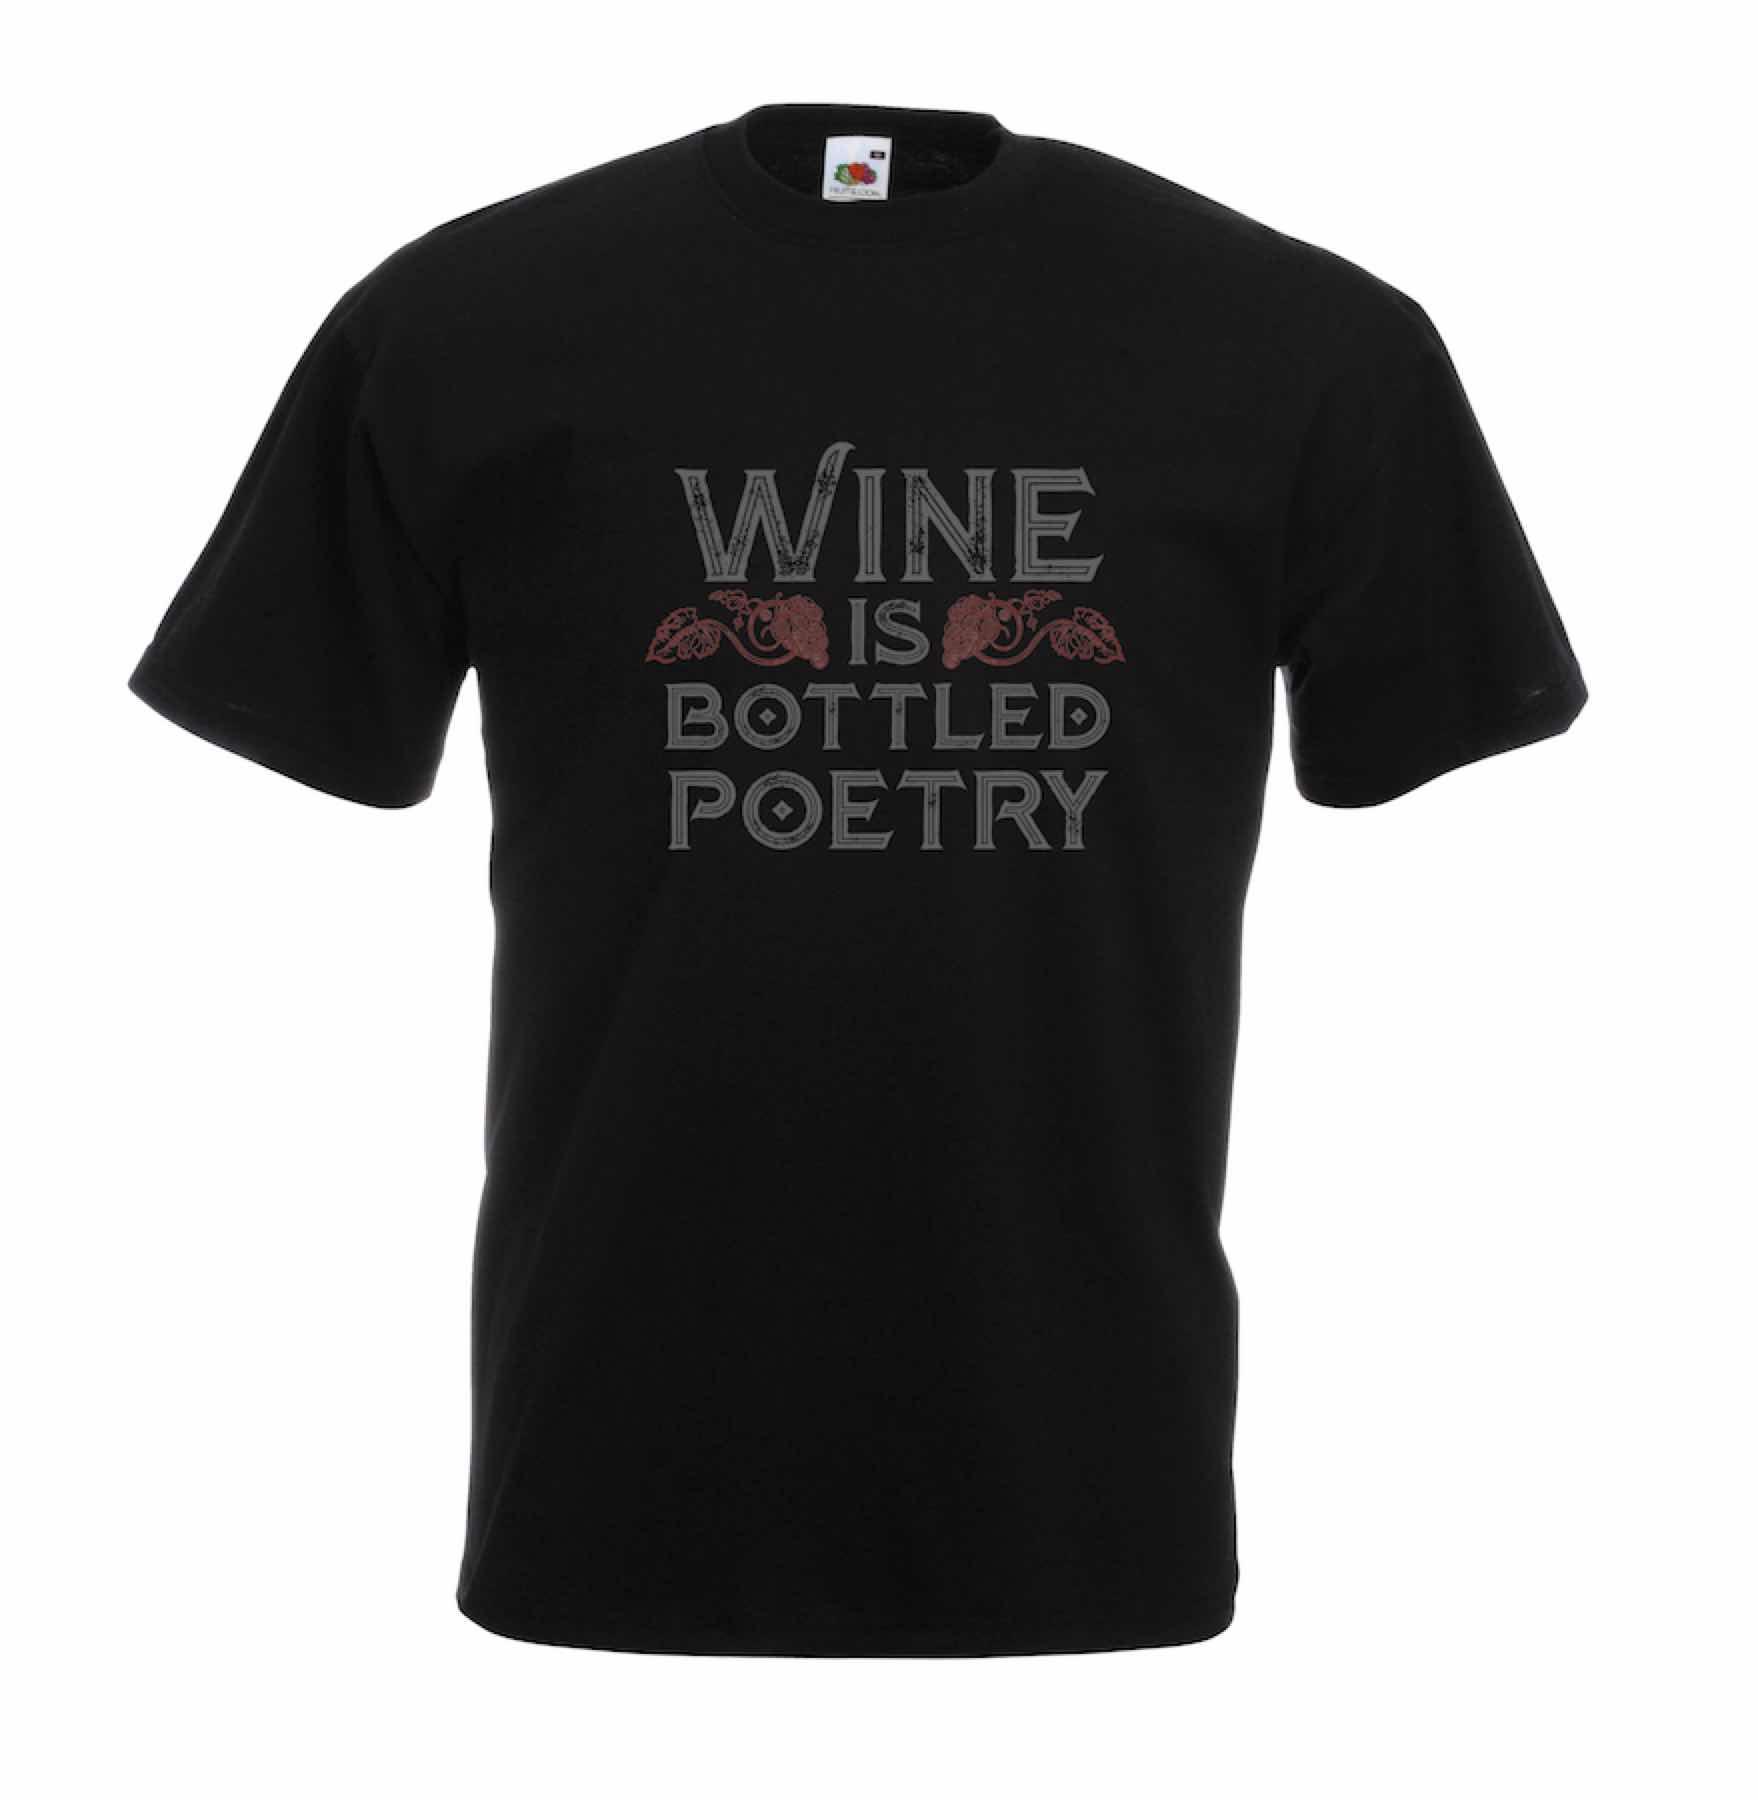 Bottled Poetry design for t-shirt, hoodie & sweatshirt